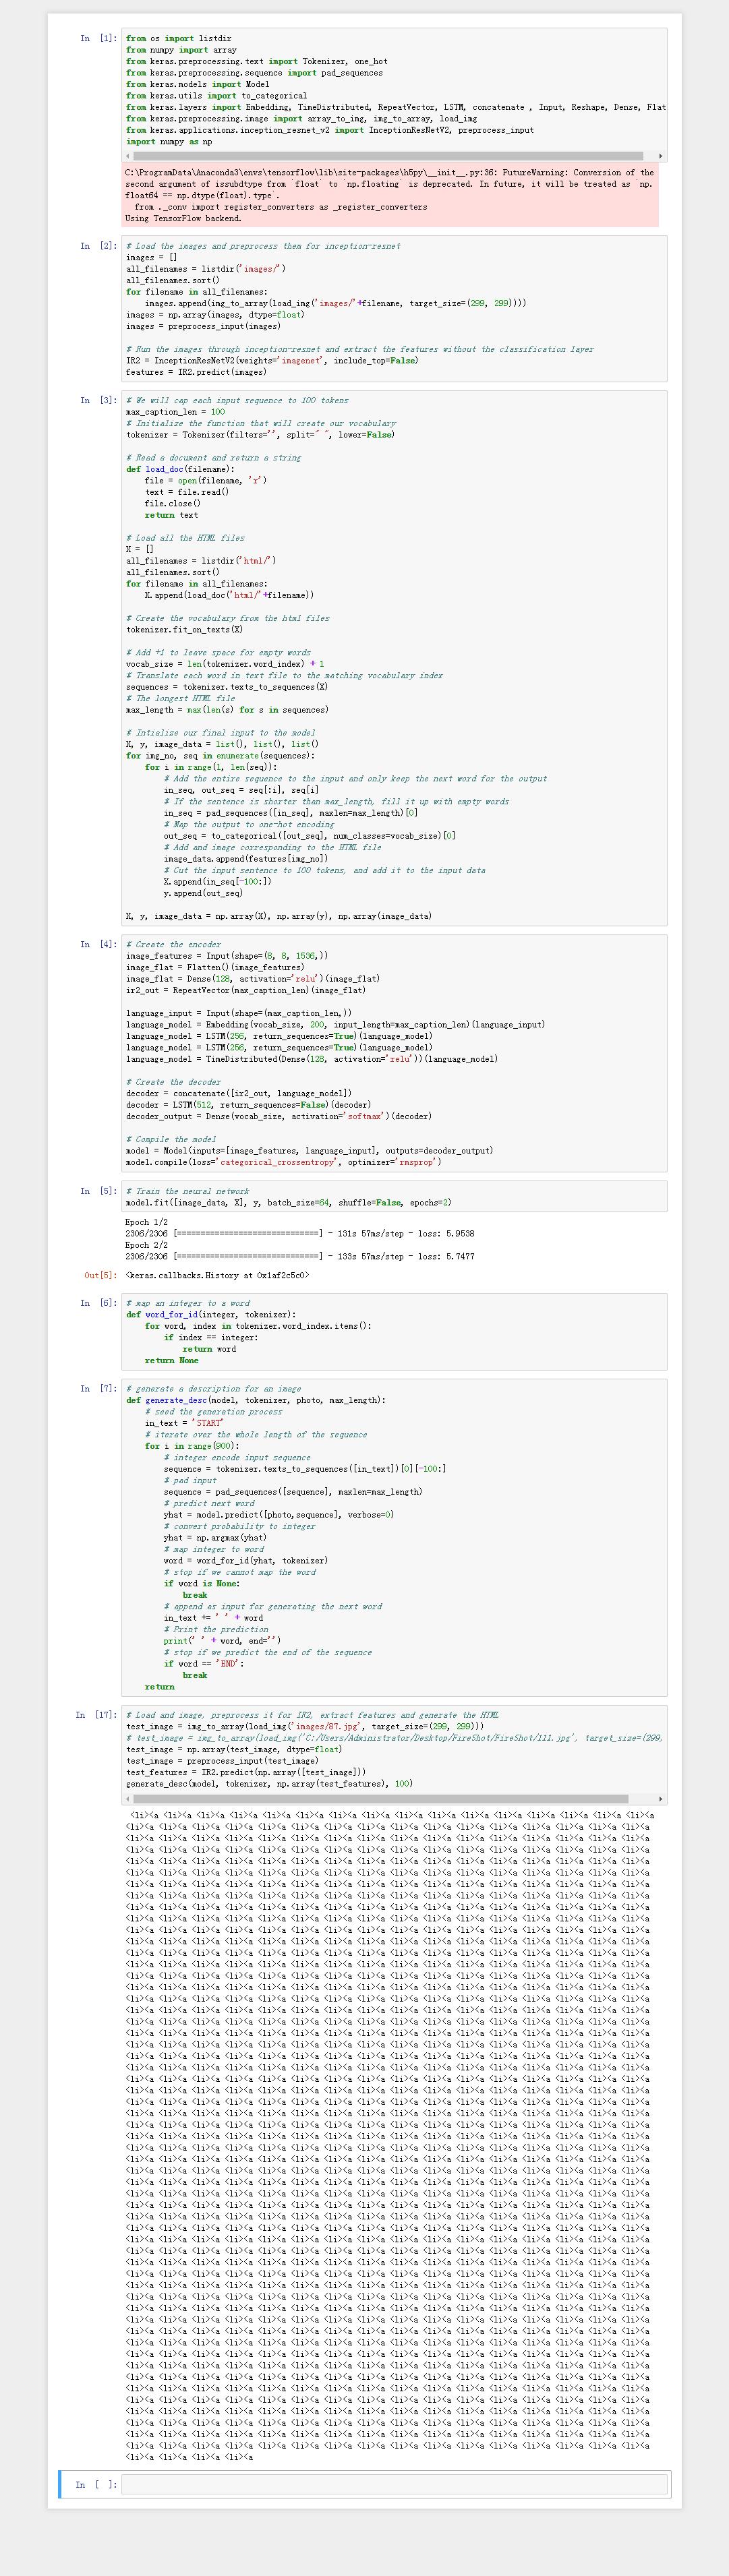 fireshot capture 2 - html_ - http___localhost_8888_notebooks_des